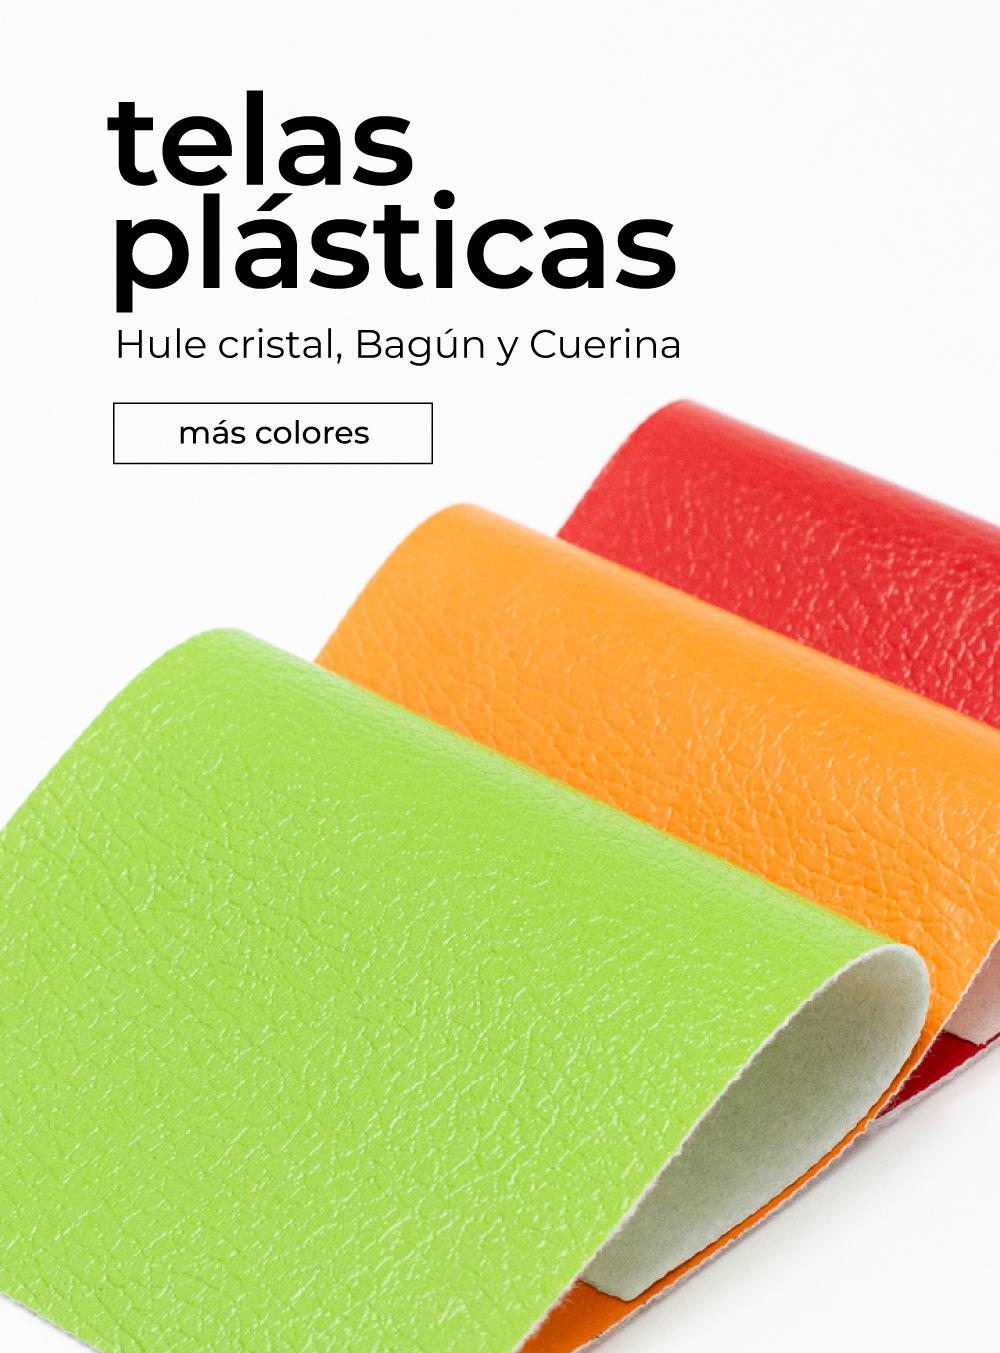 telas plasticas